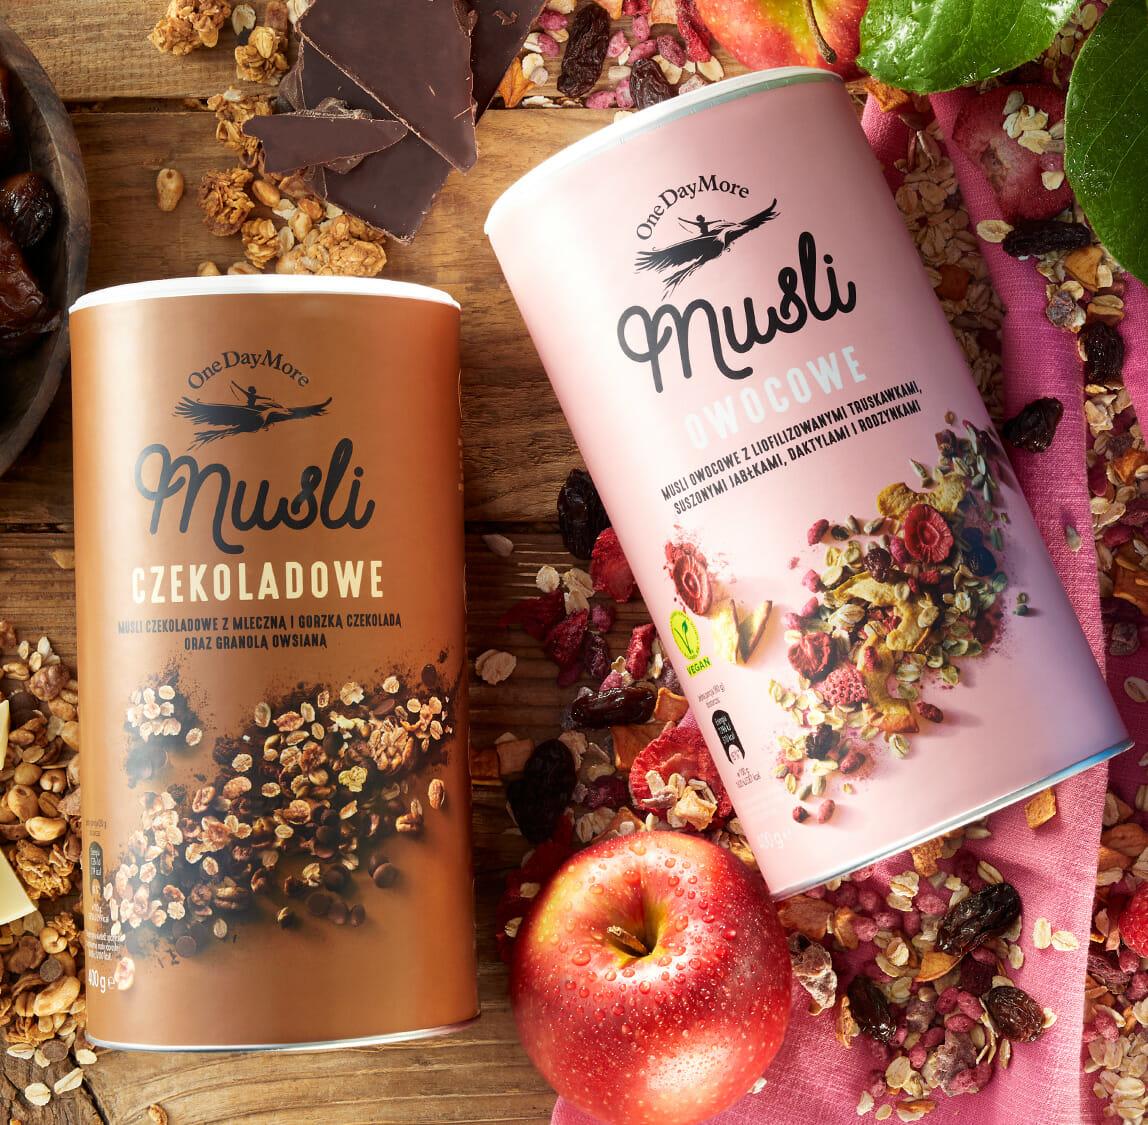 musli-czekoladowe-onedaymore-dodatkowe